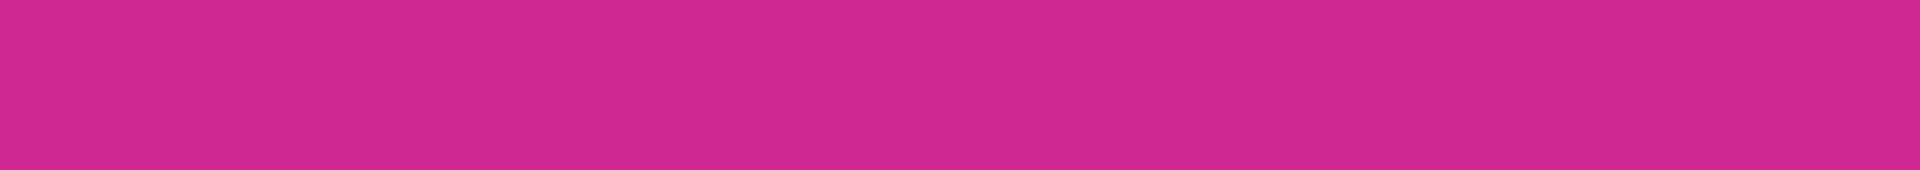 Pinkbar